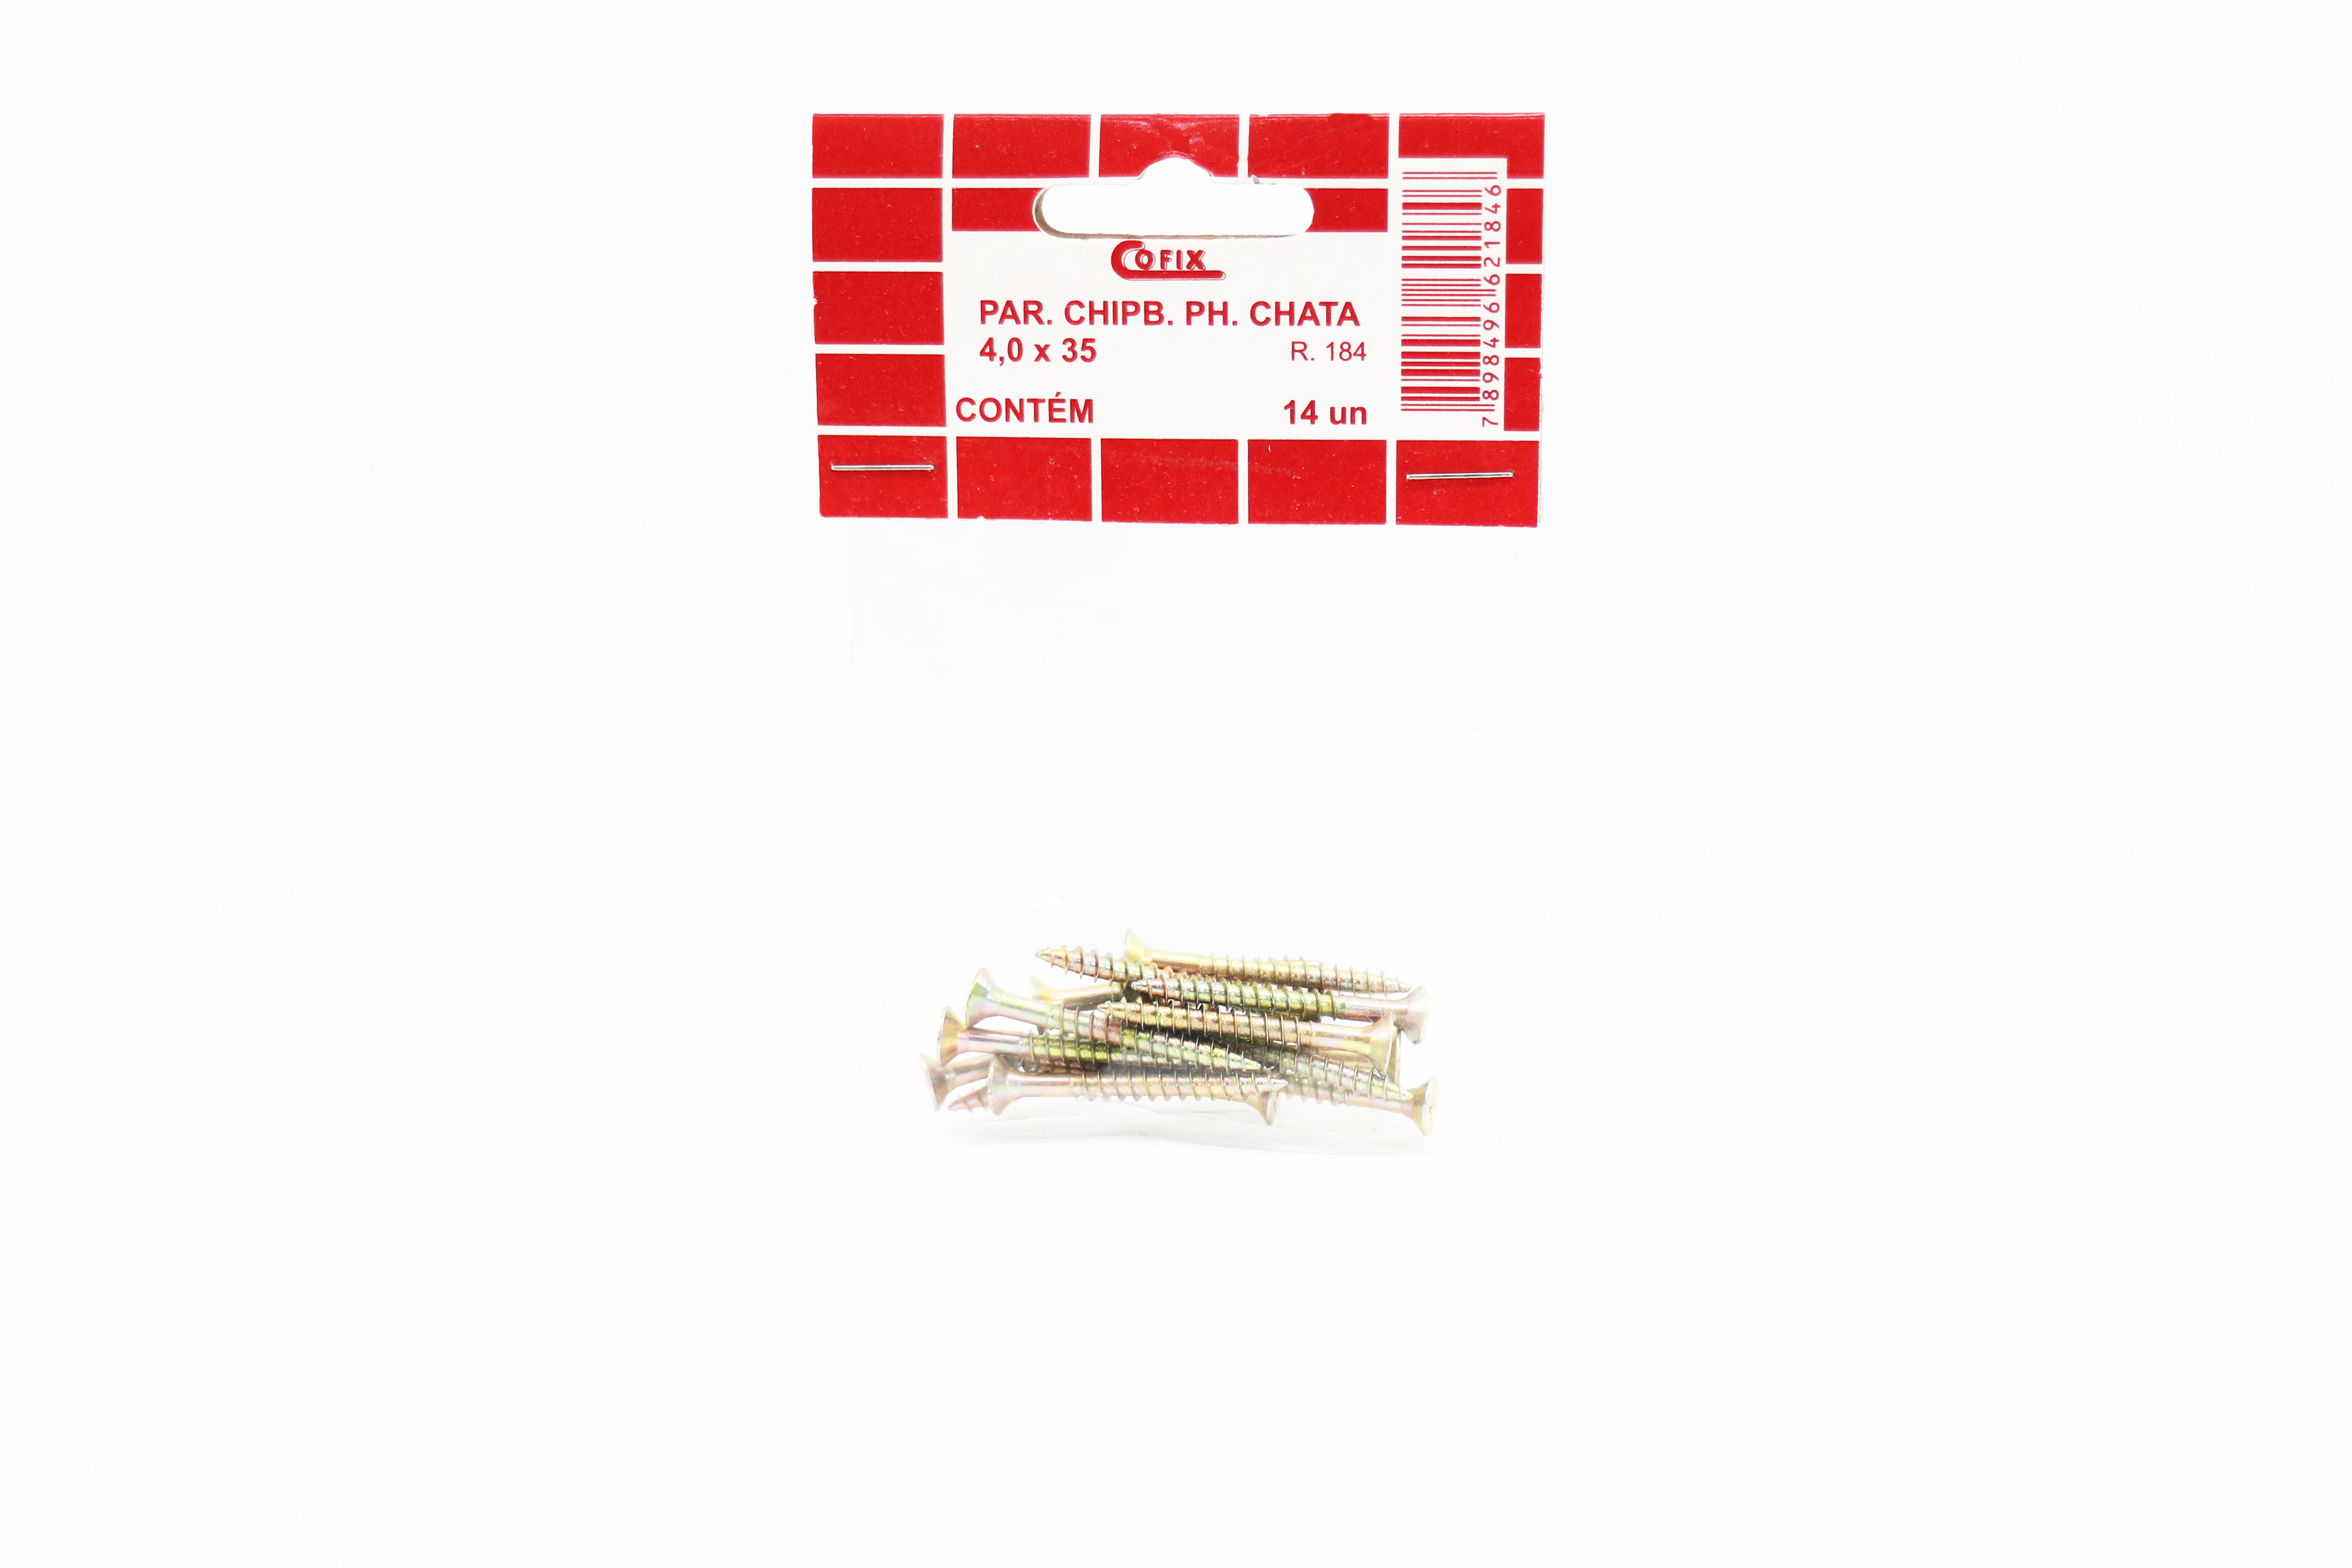 Cartela de Parafuso Chip 4,0x35 14un Cofix